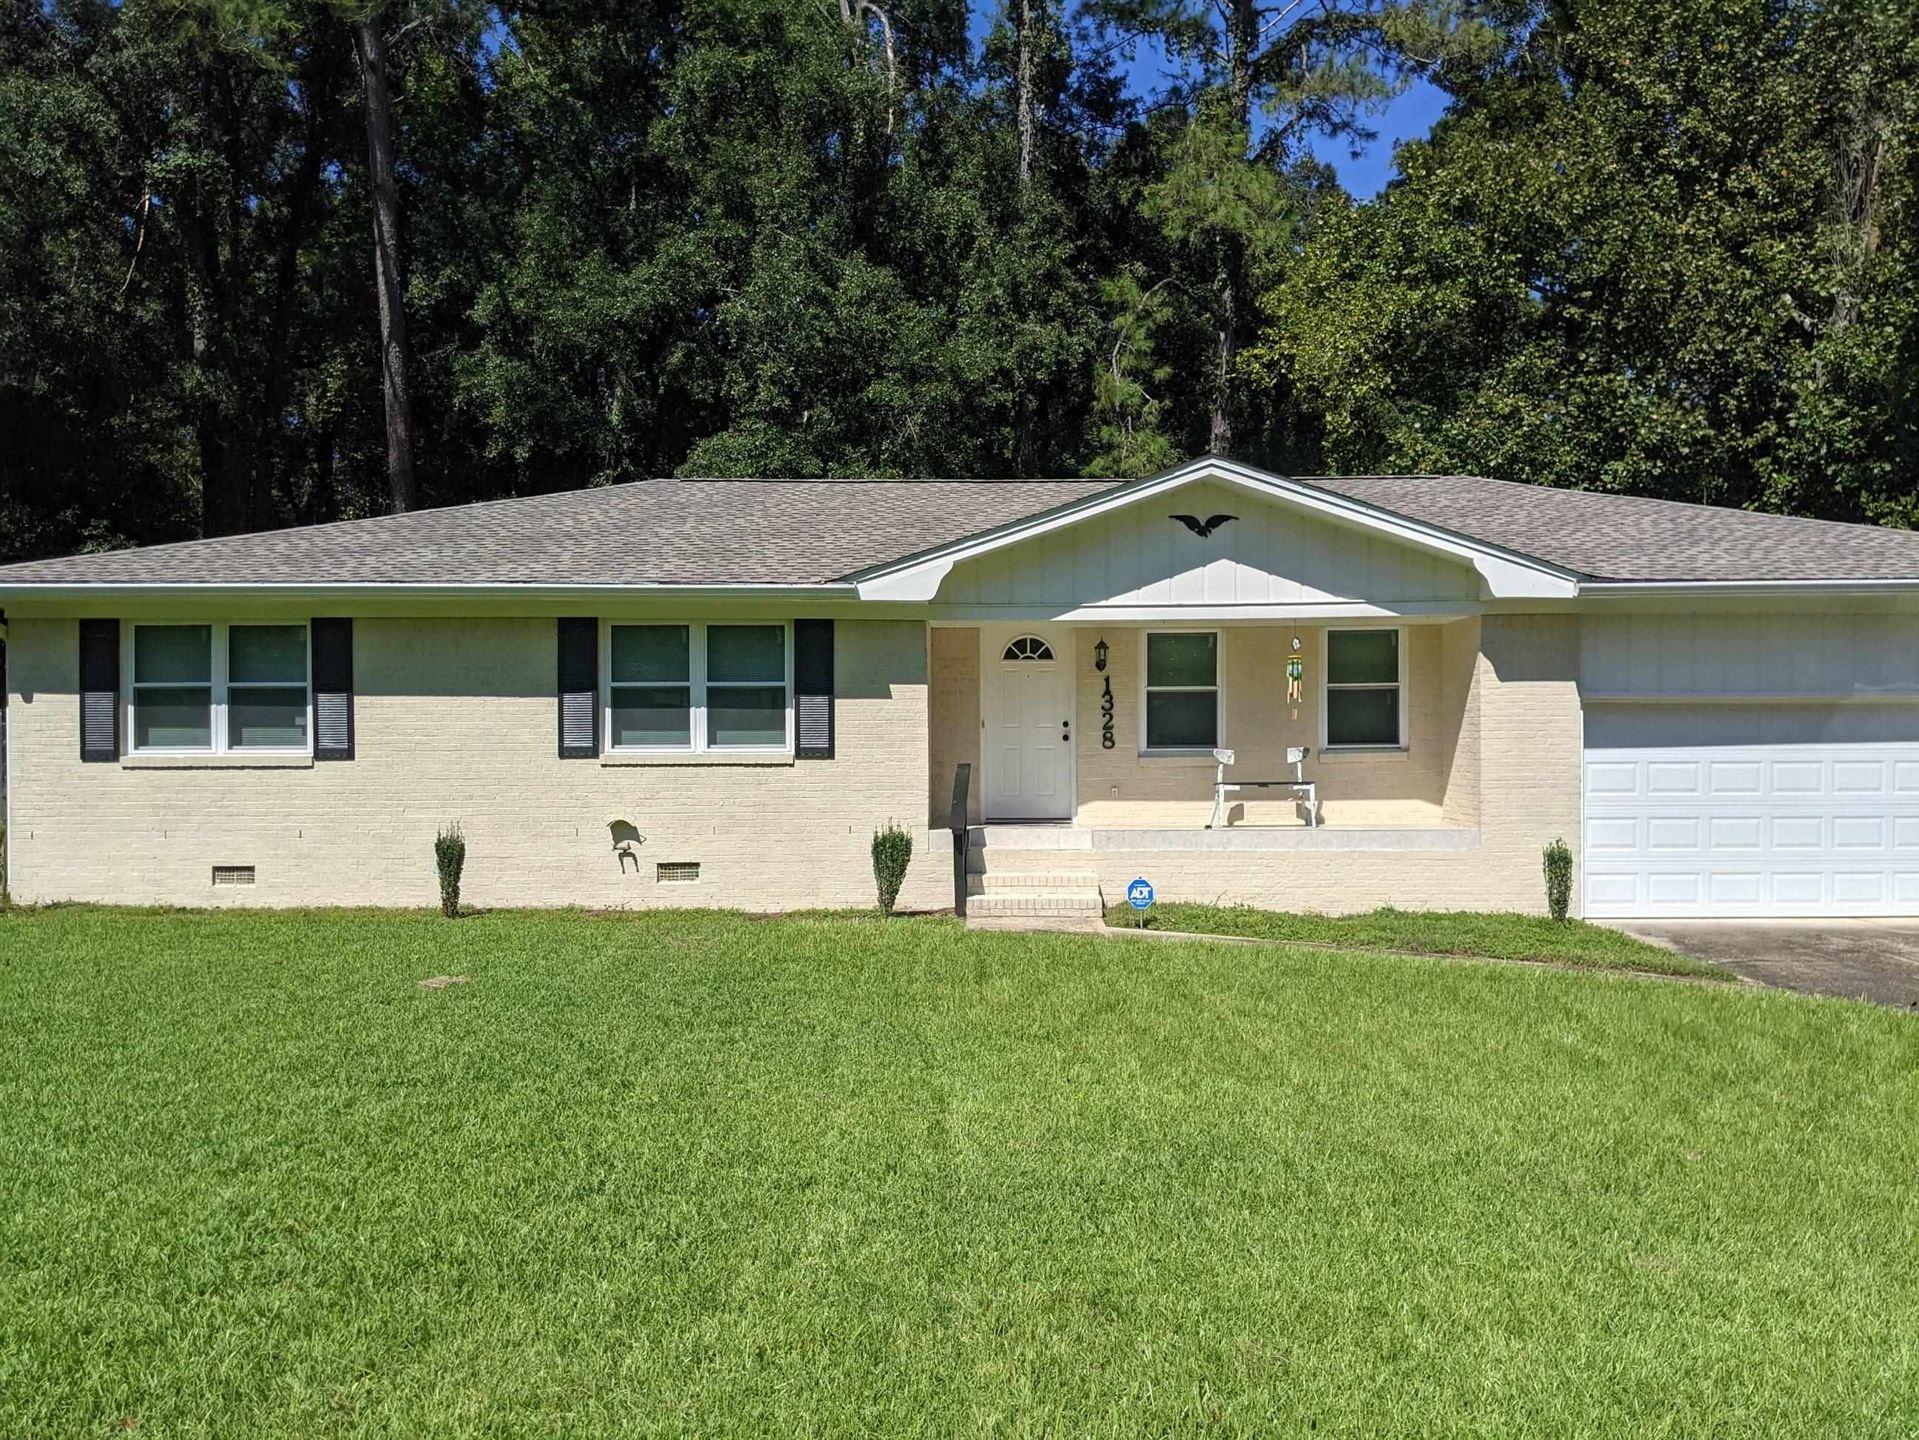 Photo of 1328 Linwood Drive, TALLAHASSEE, FL 32304 (MLS # 337138)